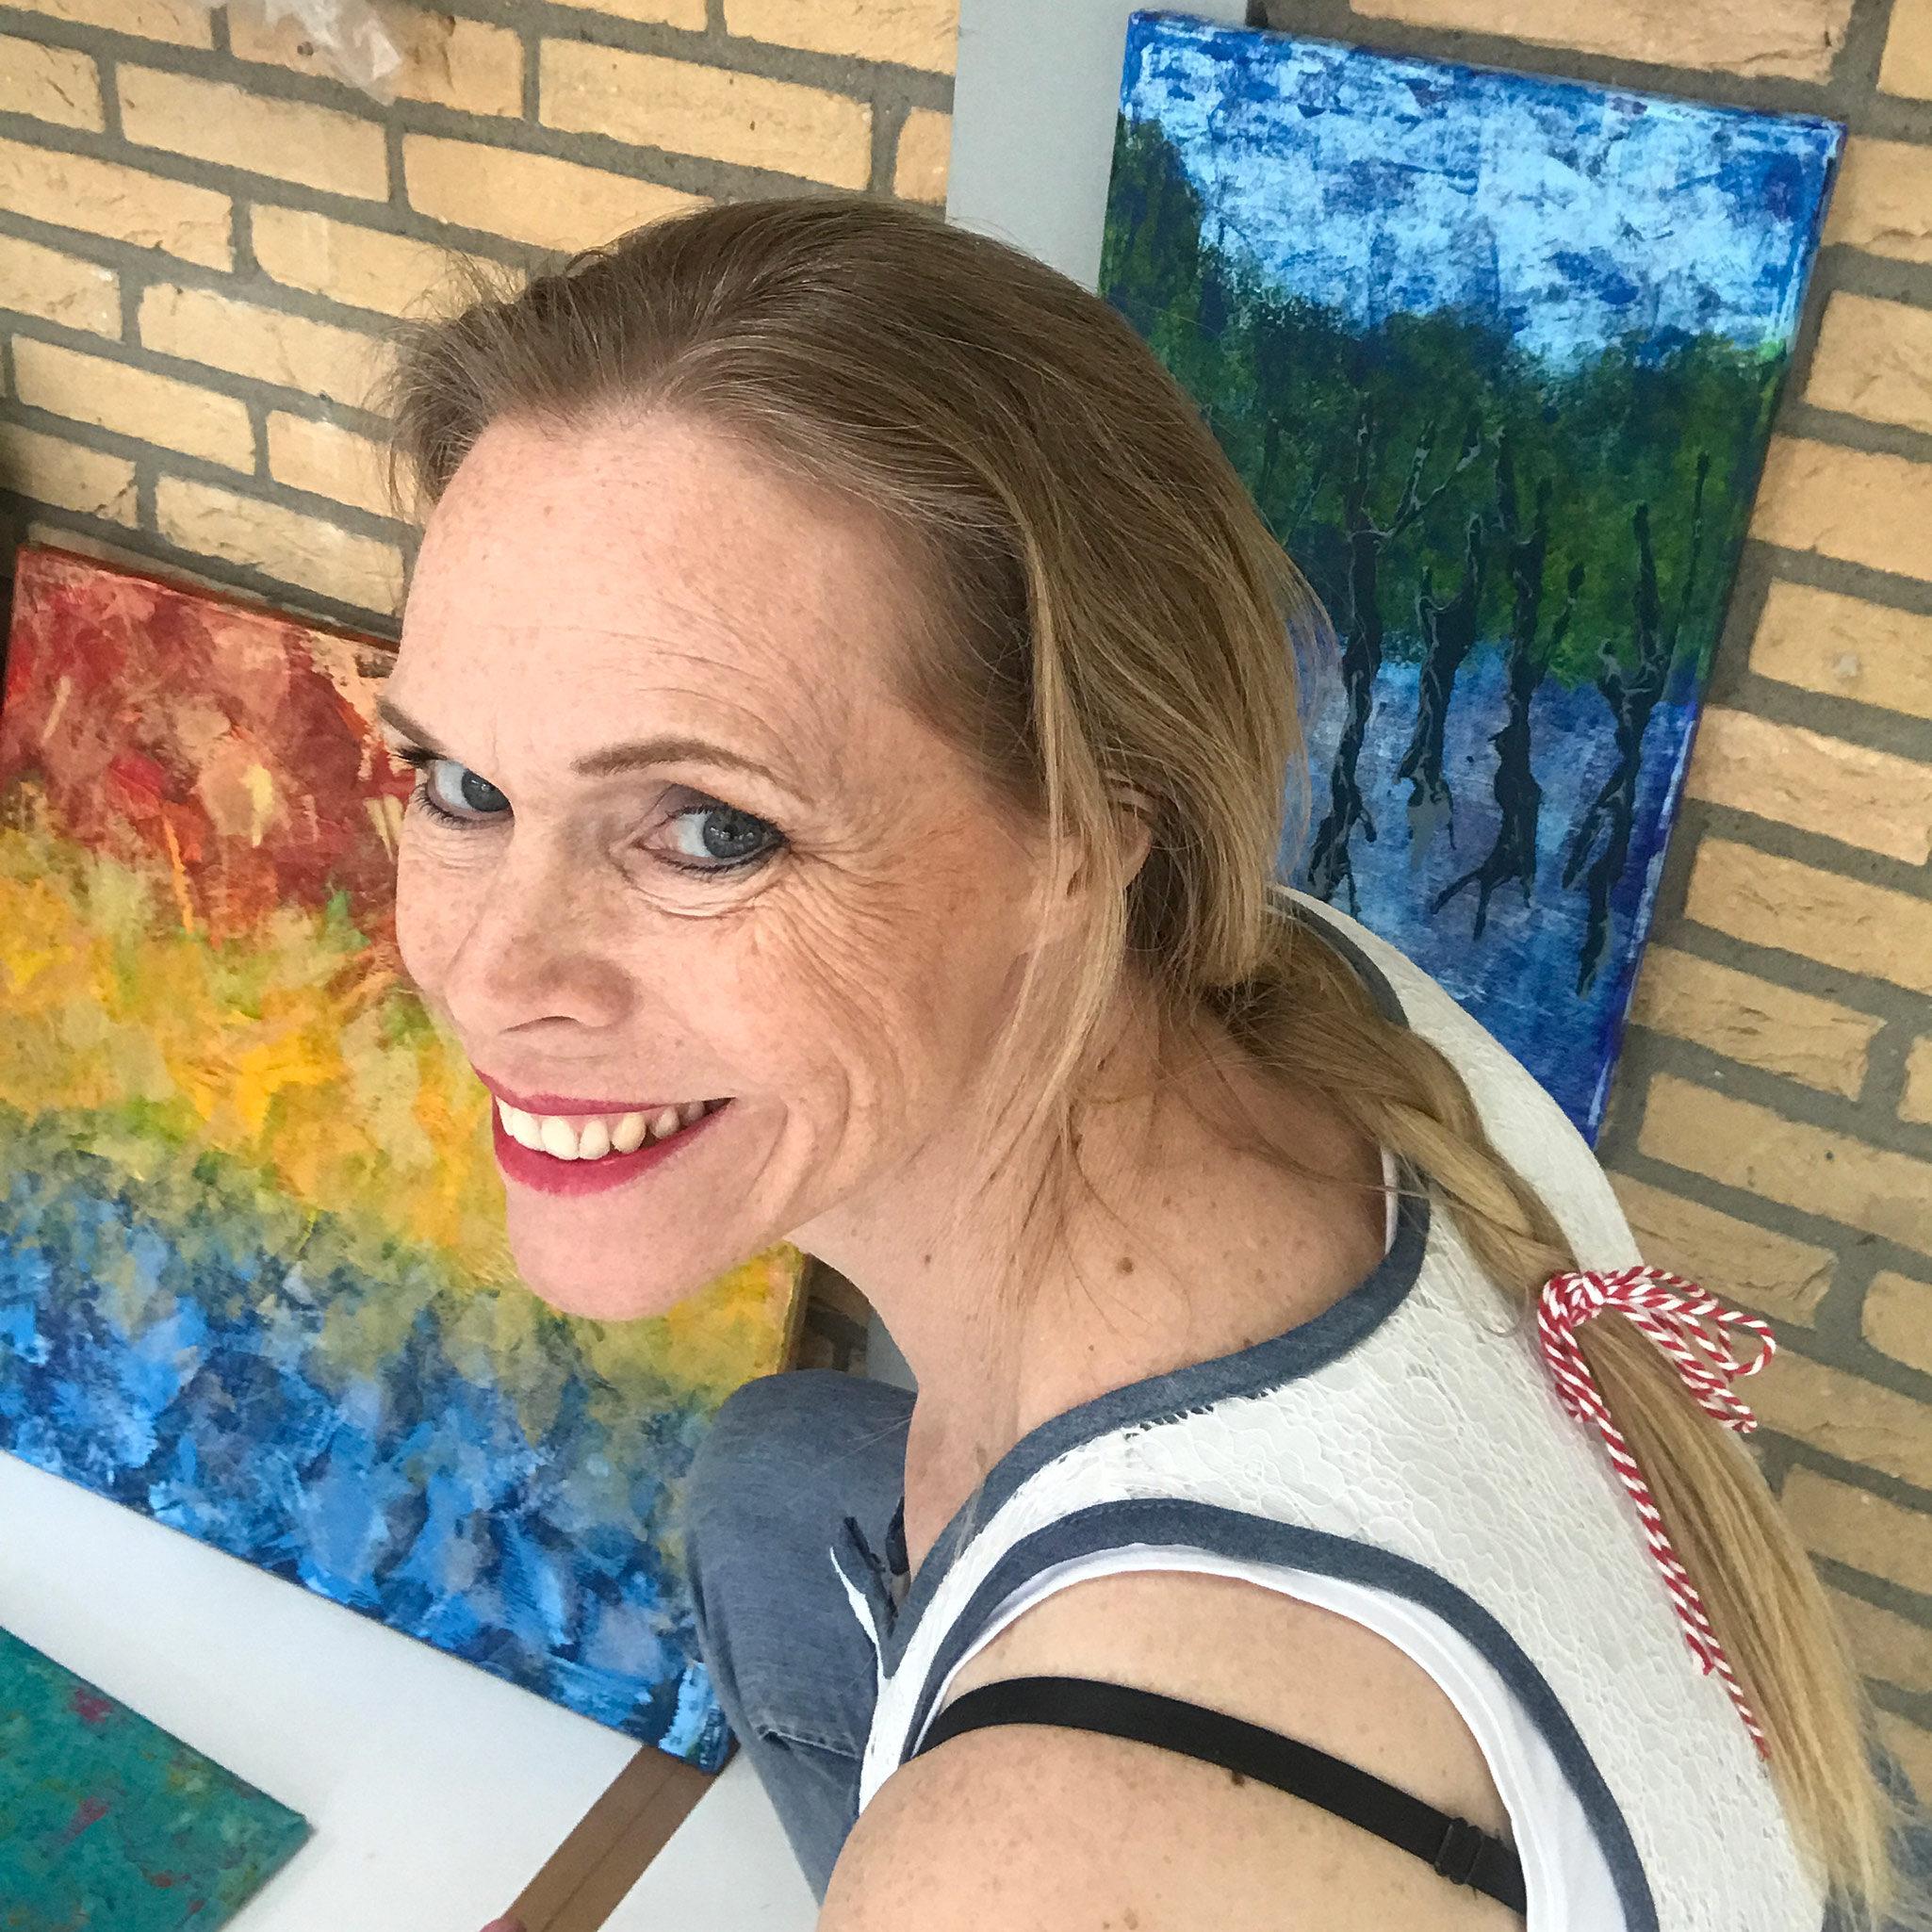 2 MAAL EE   Elise Eekhout   Corona Stories   Facebook-Conversations 01   the making of